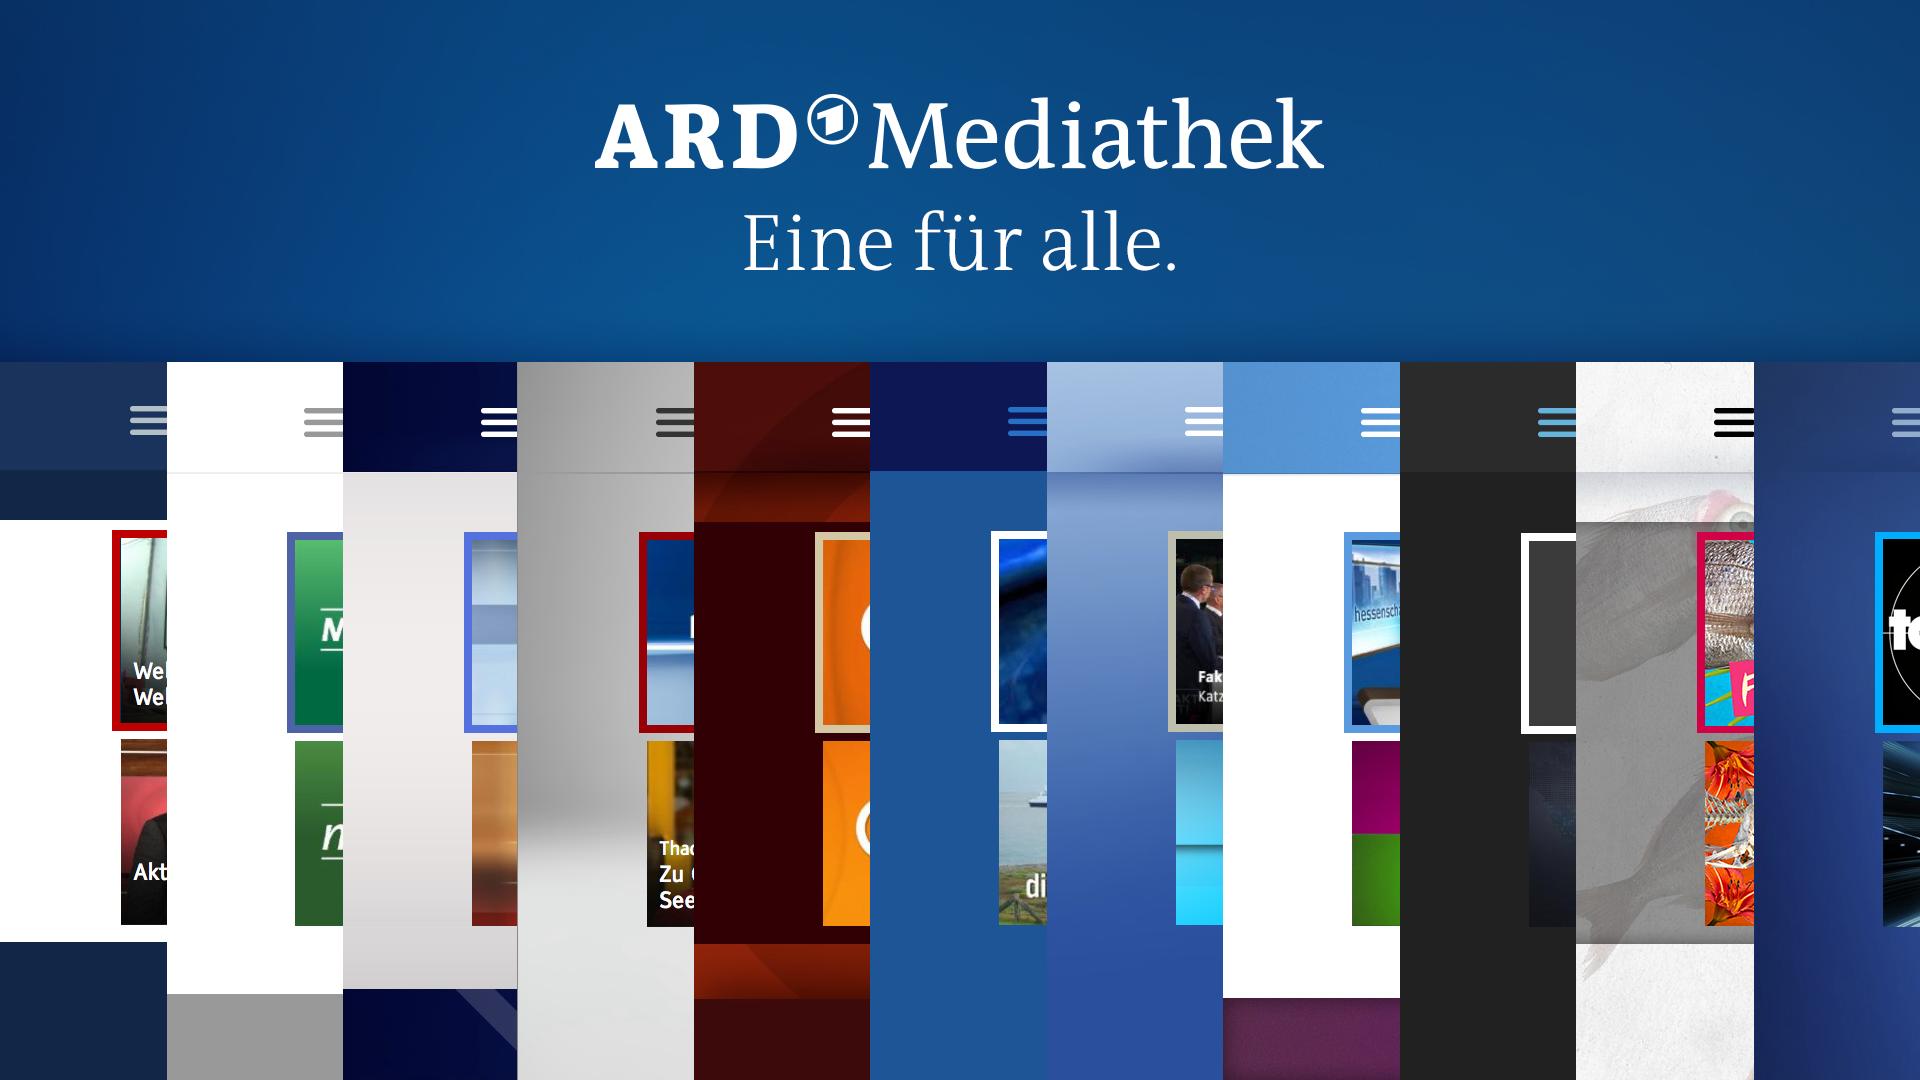 ard mediathek video download online